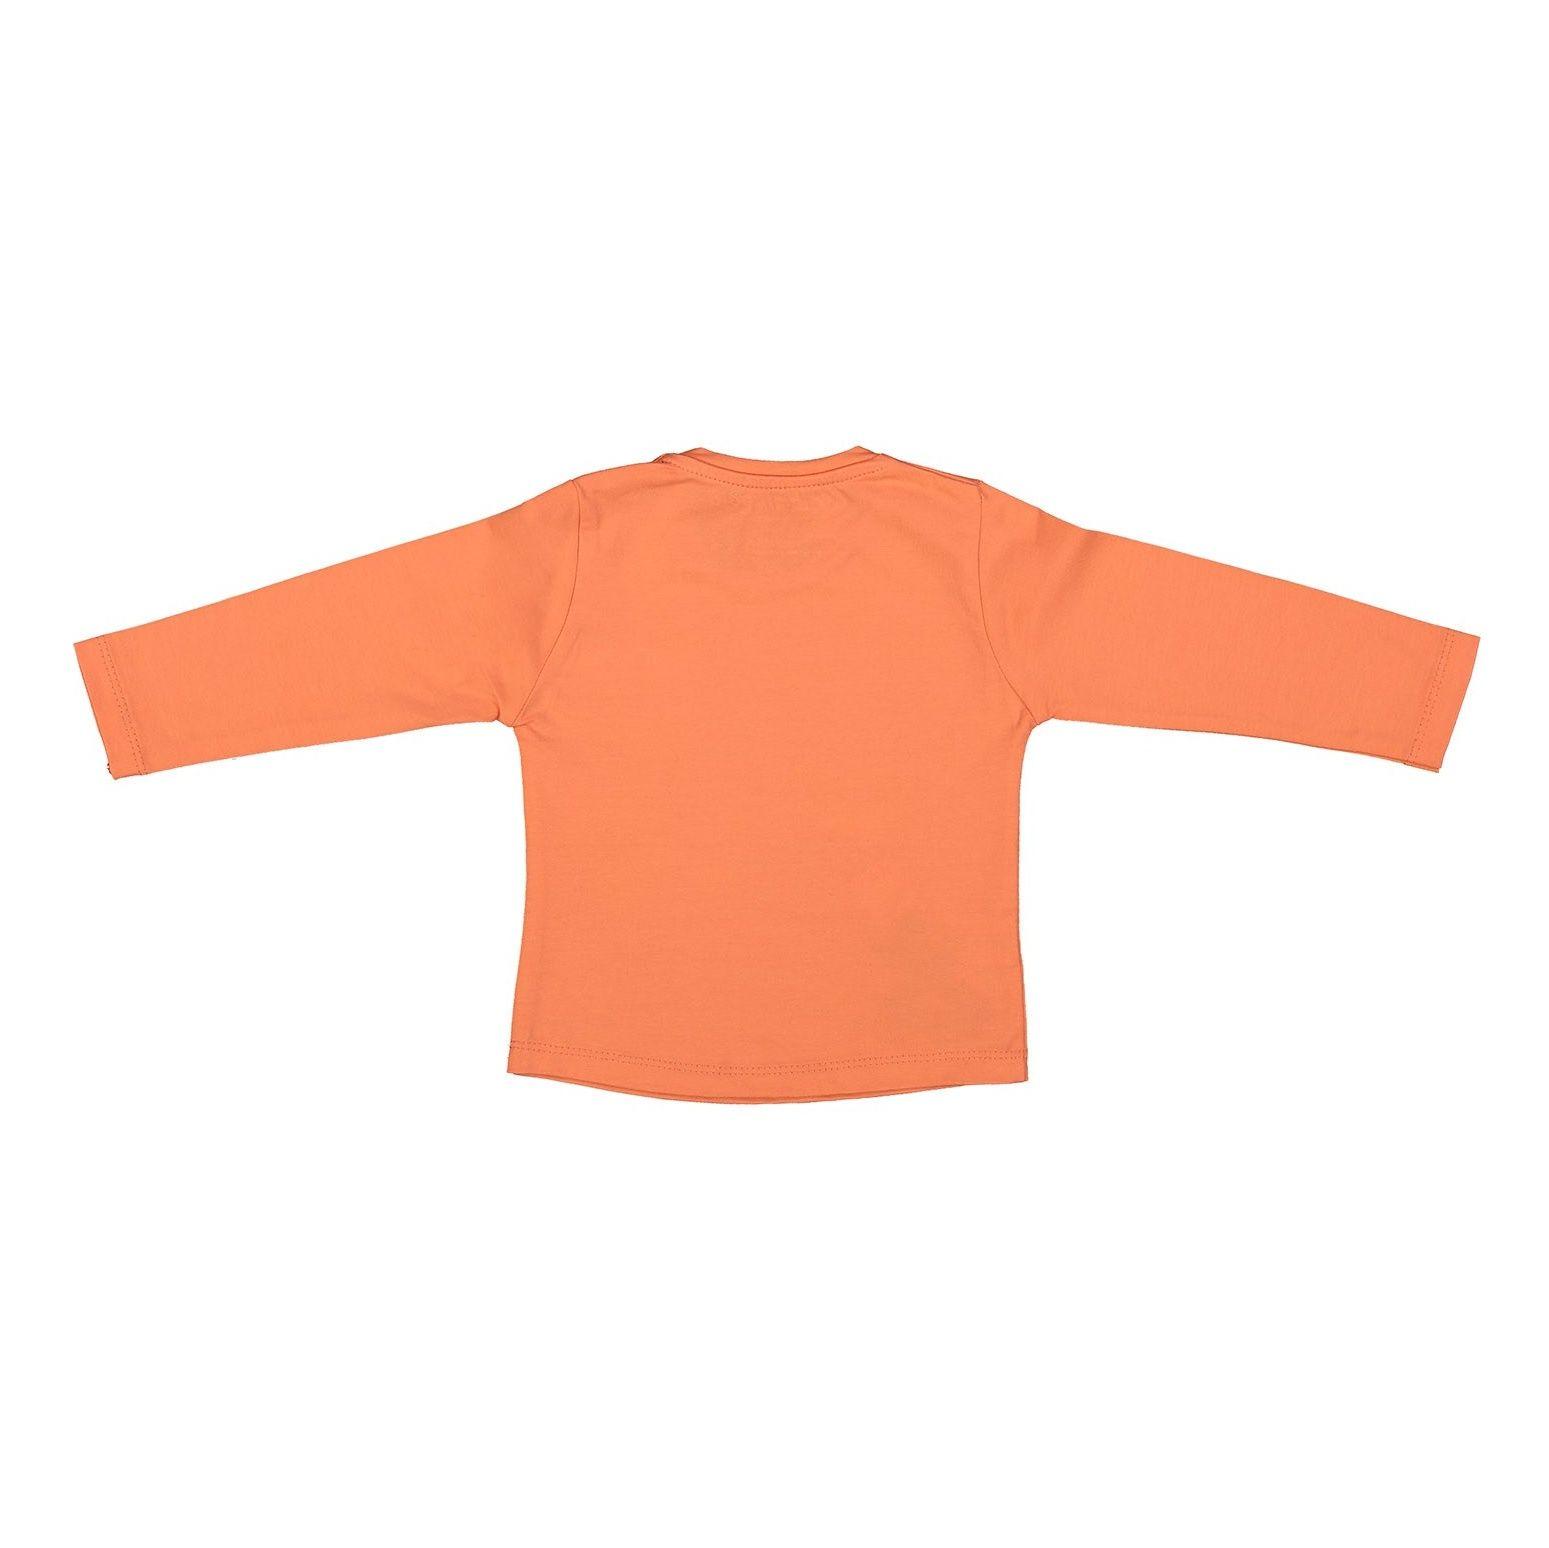 تی شرت نخی یقه گرد دخترانه - سون پون - نارنجی - 2